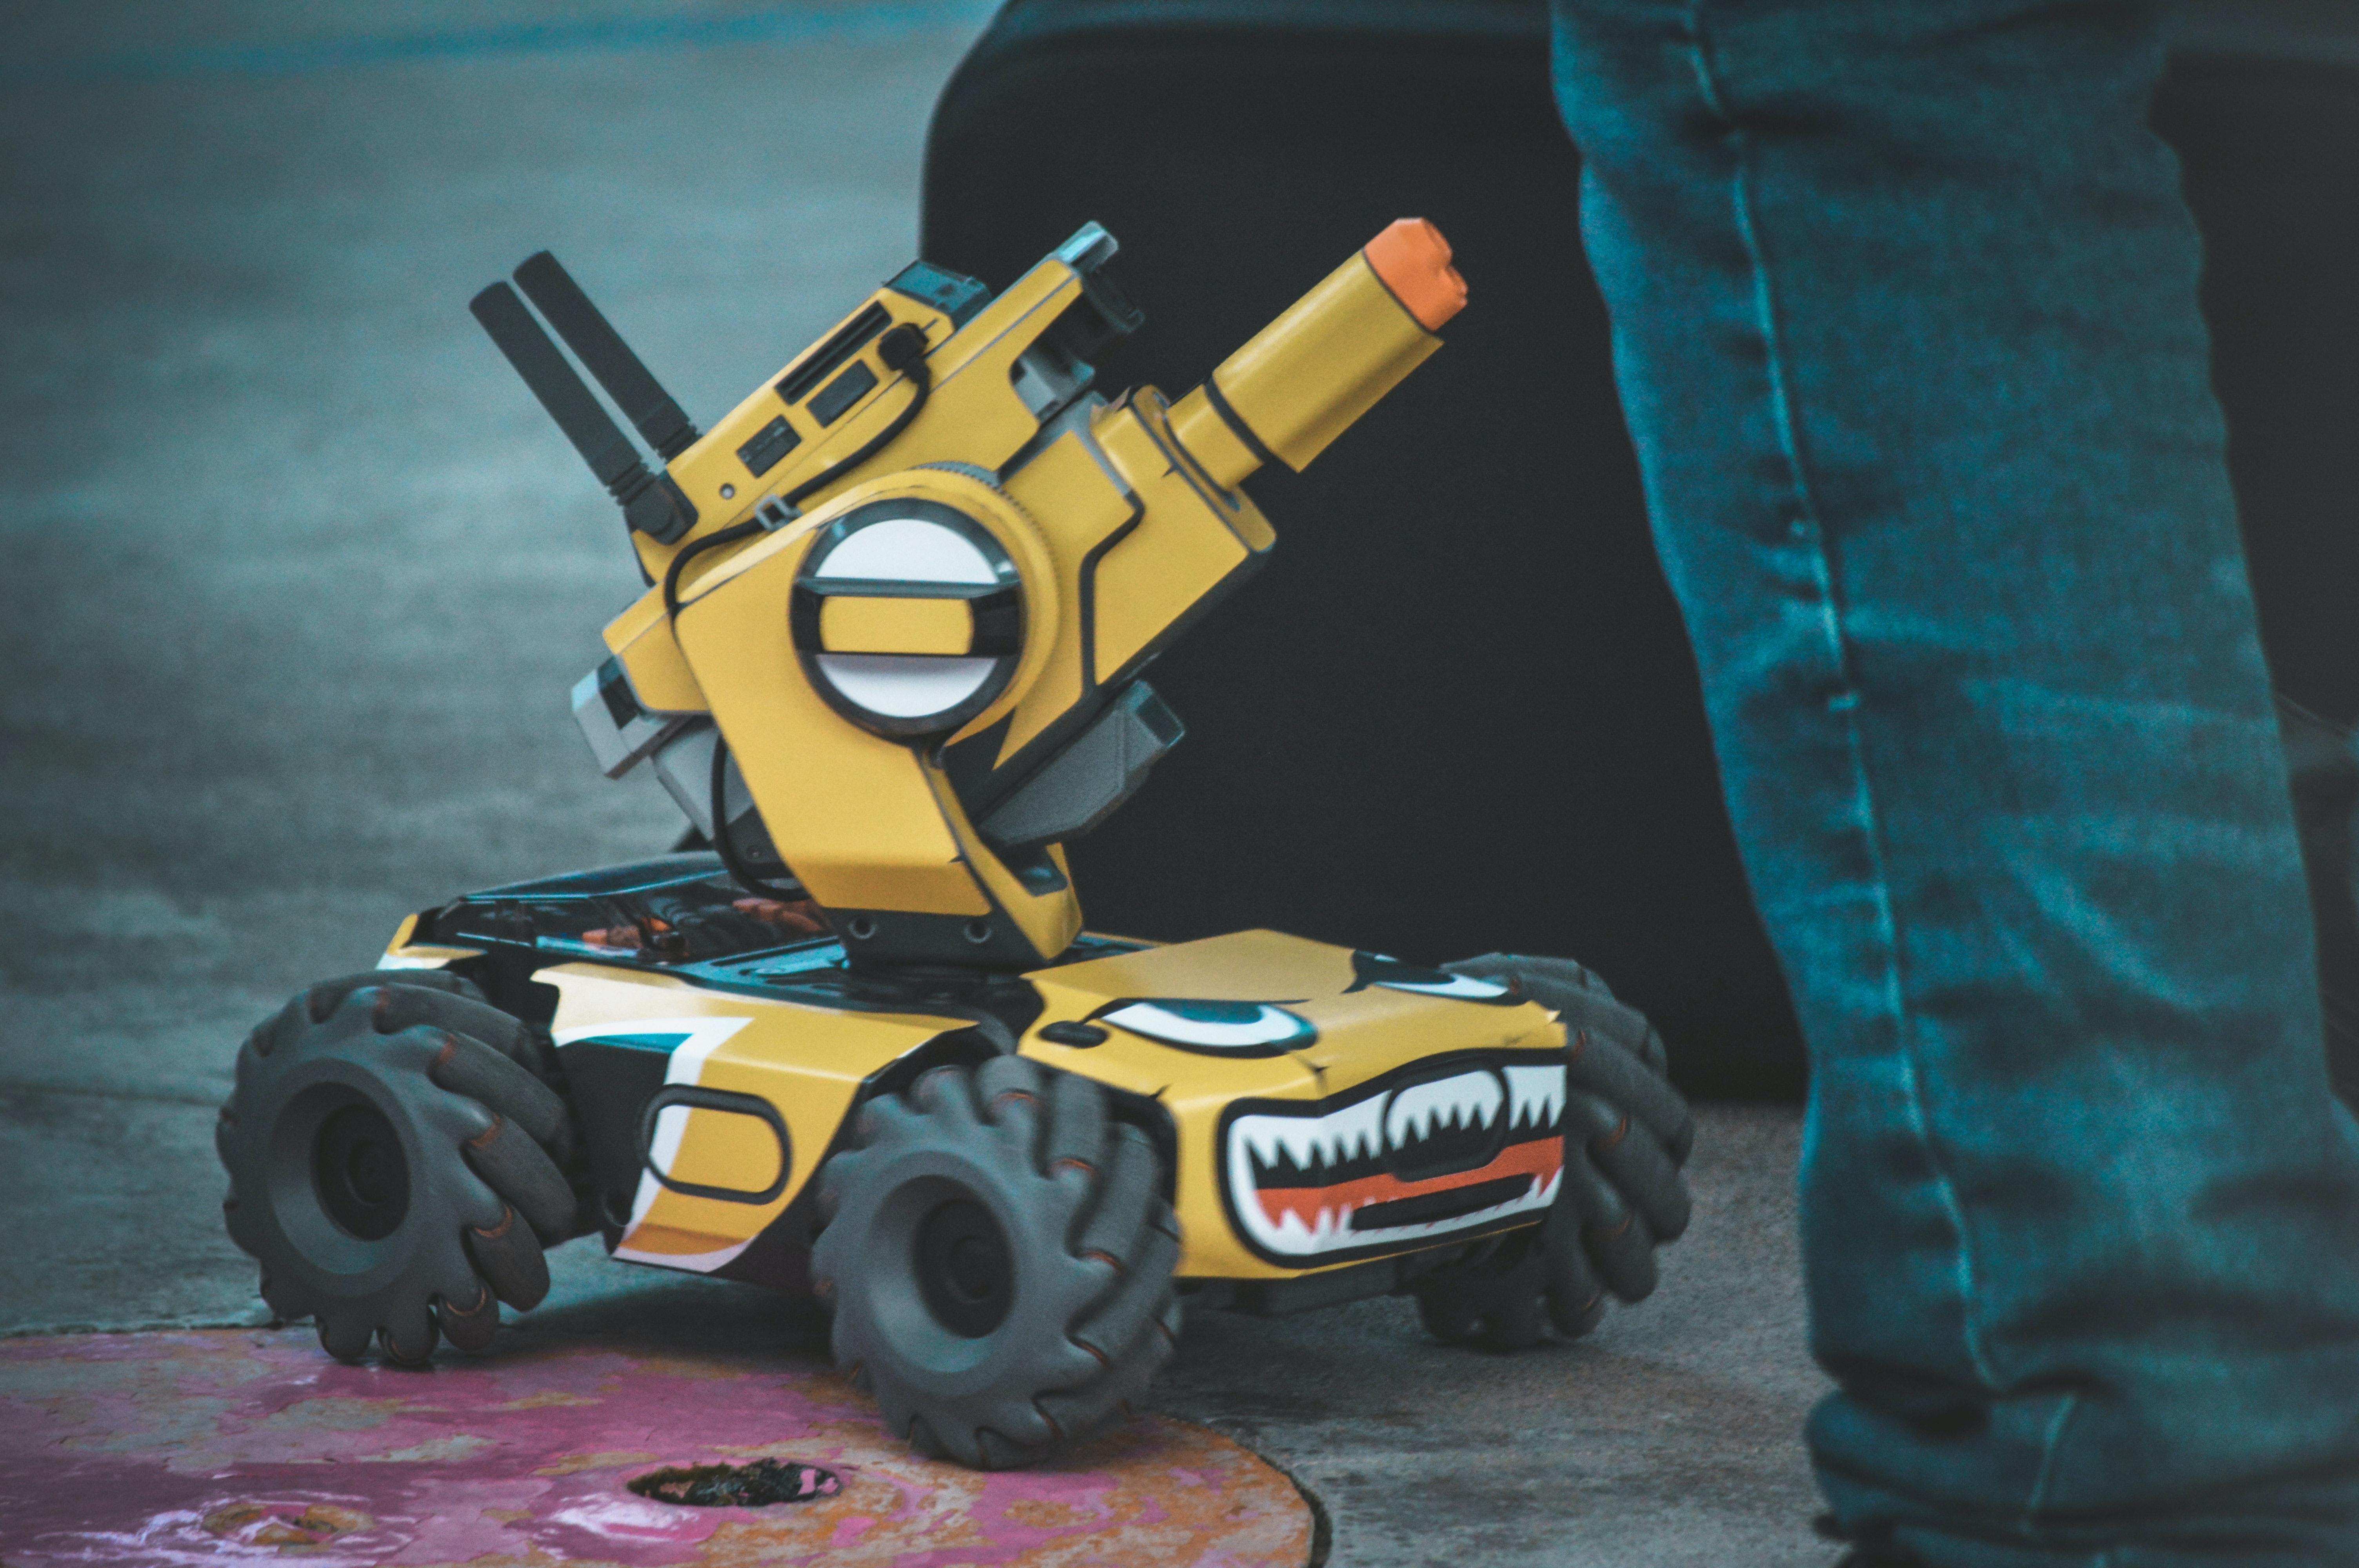 16 ROBOTS KIDS CAN ACTUALLY MAKE